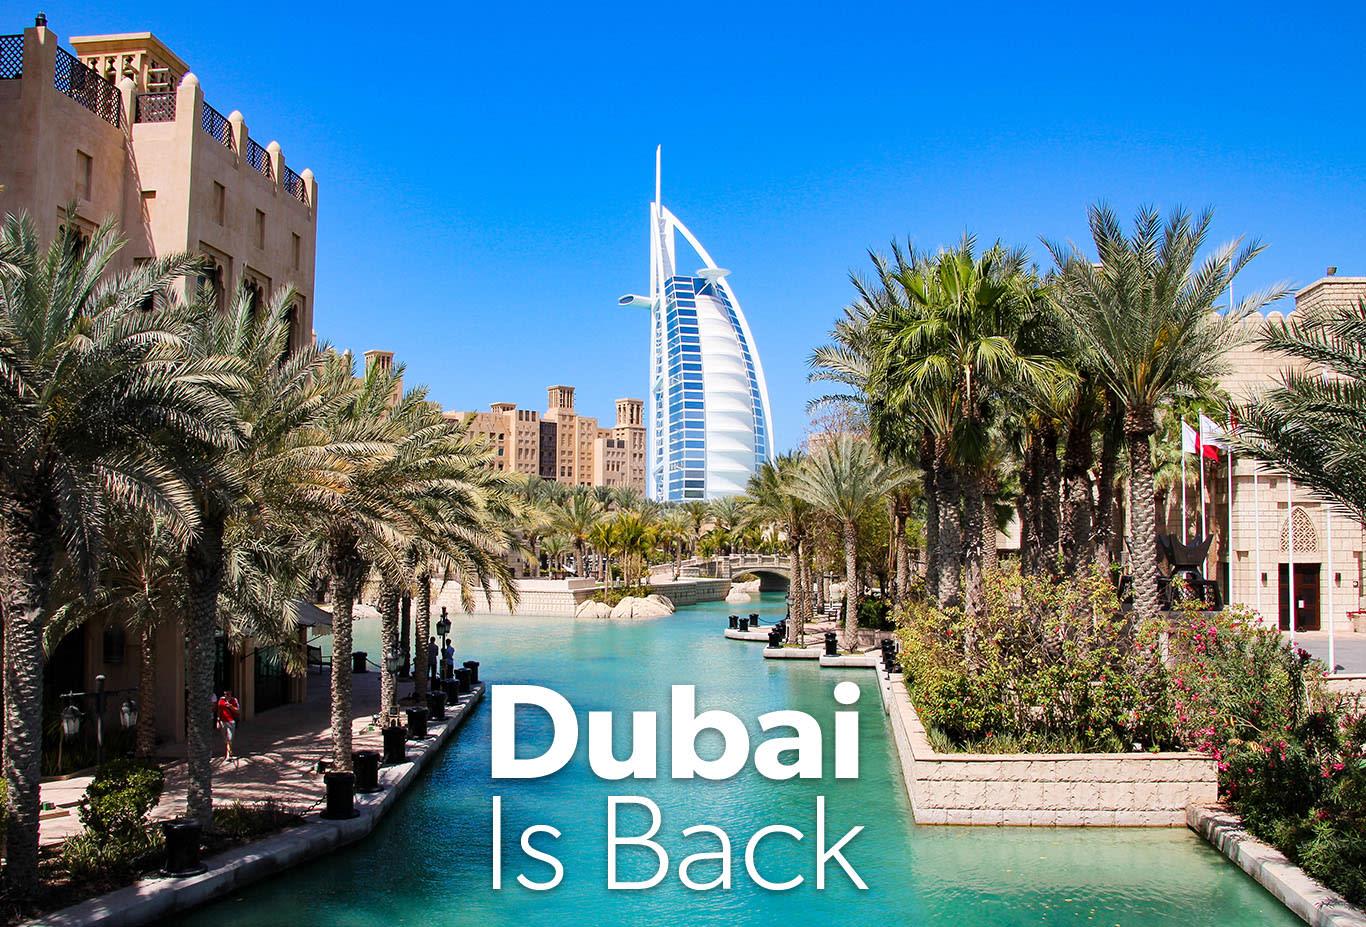 Dubai Is Back